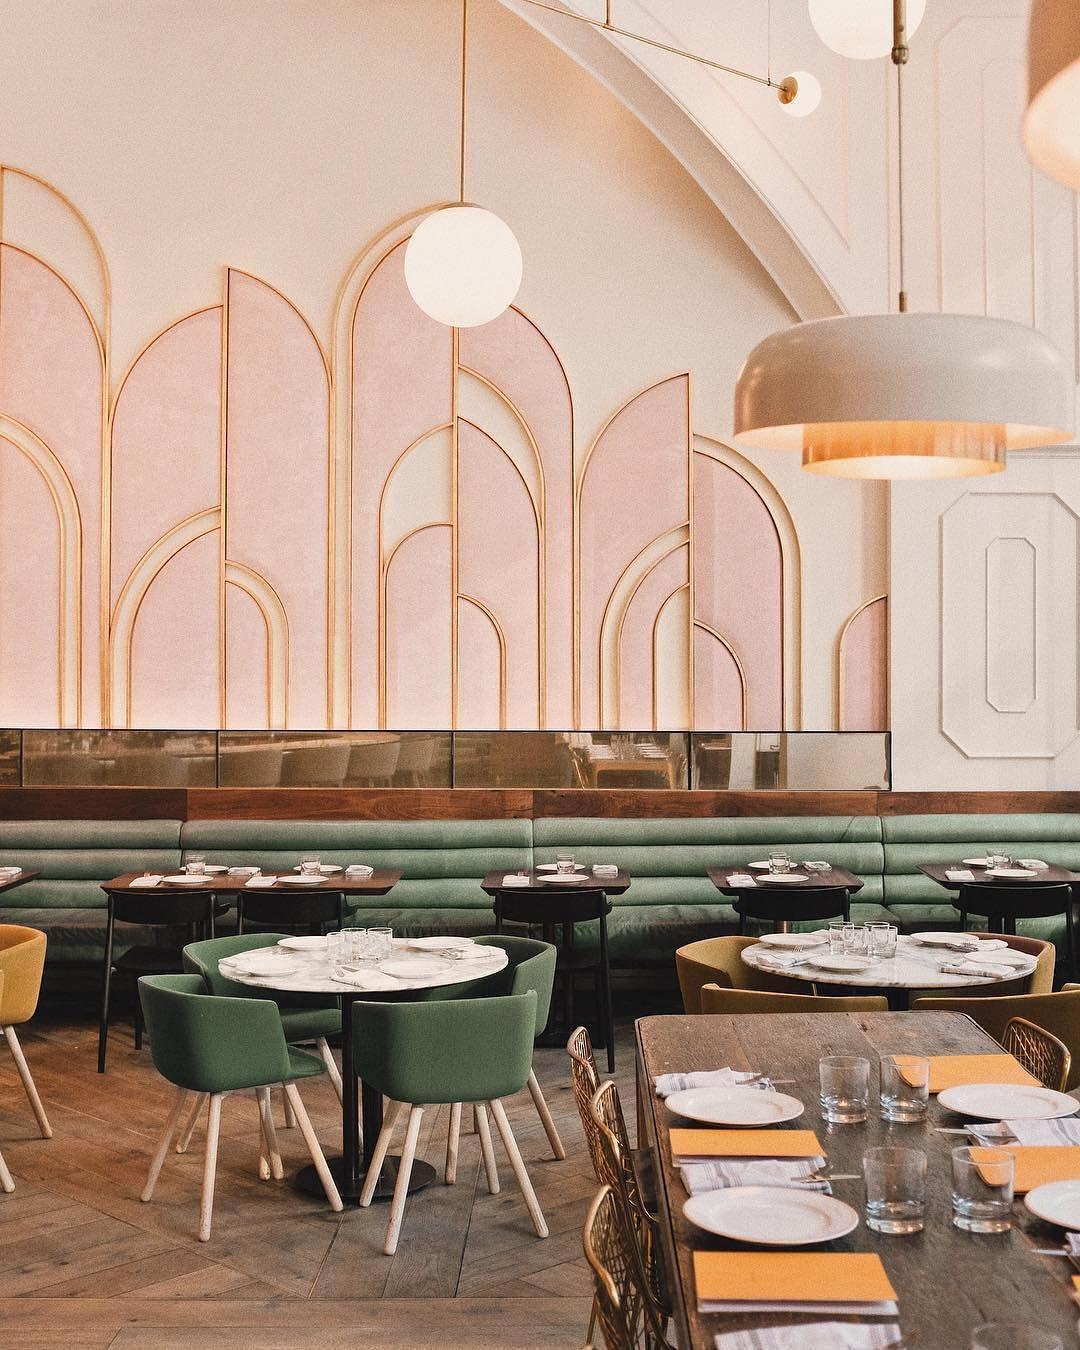 Interior Trends: Populuxe Look of the New Art Deco Style | SampleBlog